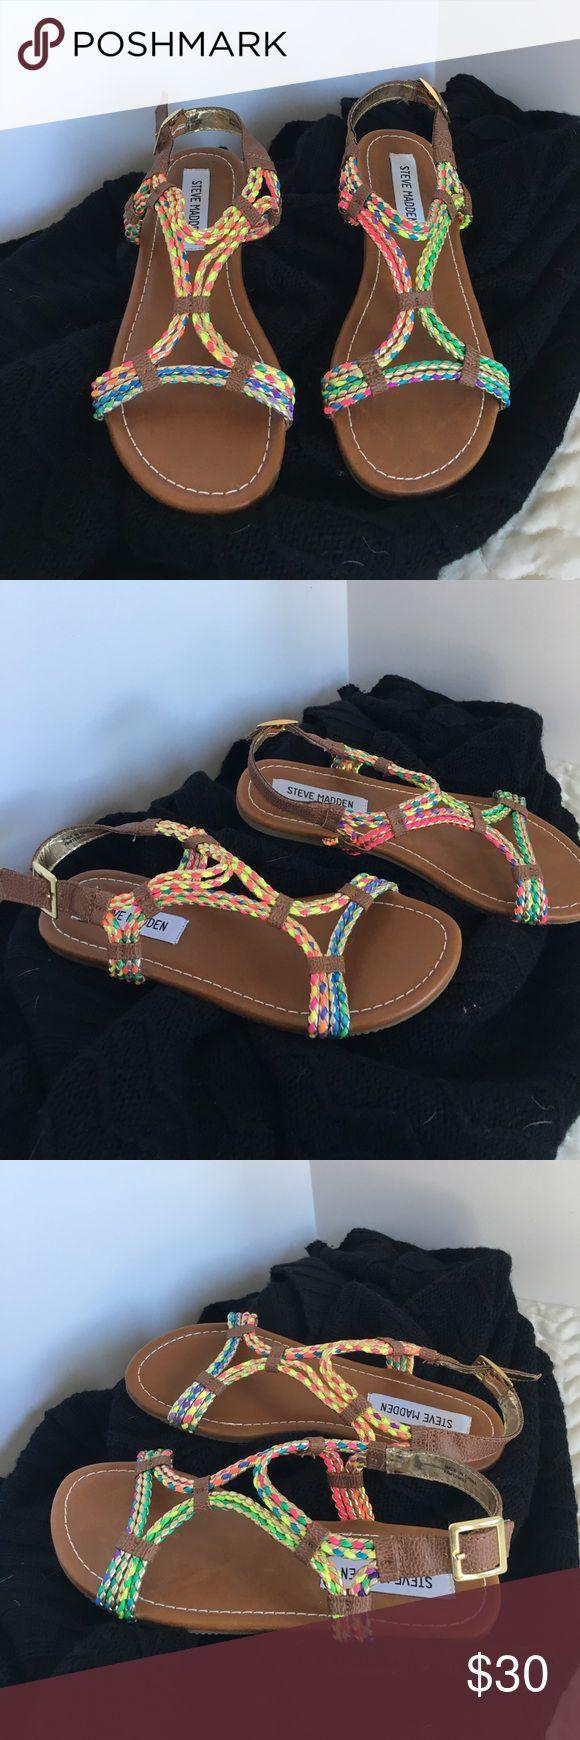 Steve Madden Multi Color Sandals NWT NWT Steve Madden Multi Color Sandals. Girls size 3.  New in the box. Never worn. Steve Madden Shoes Sandals & Flip Flops